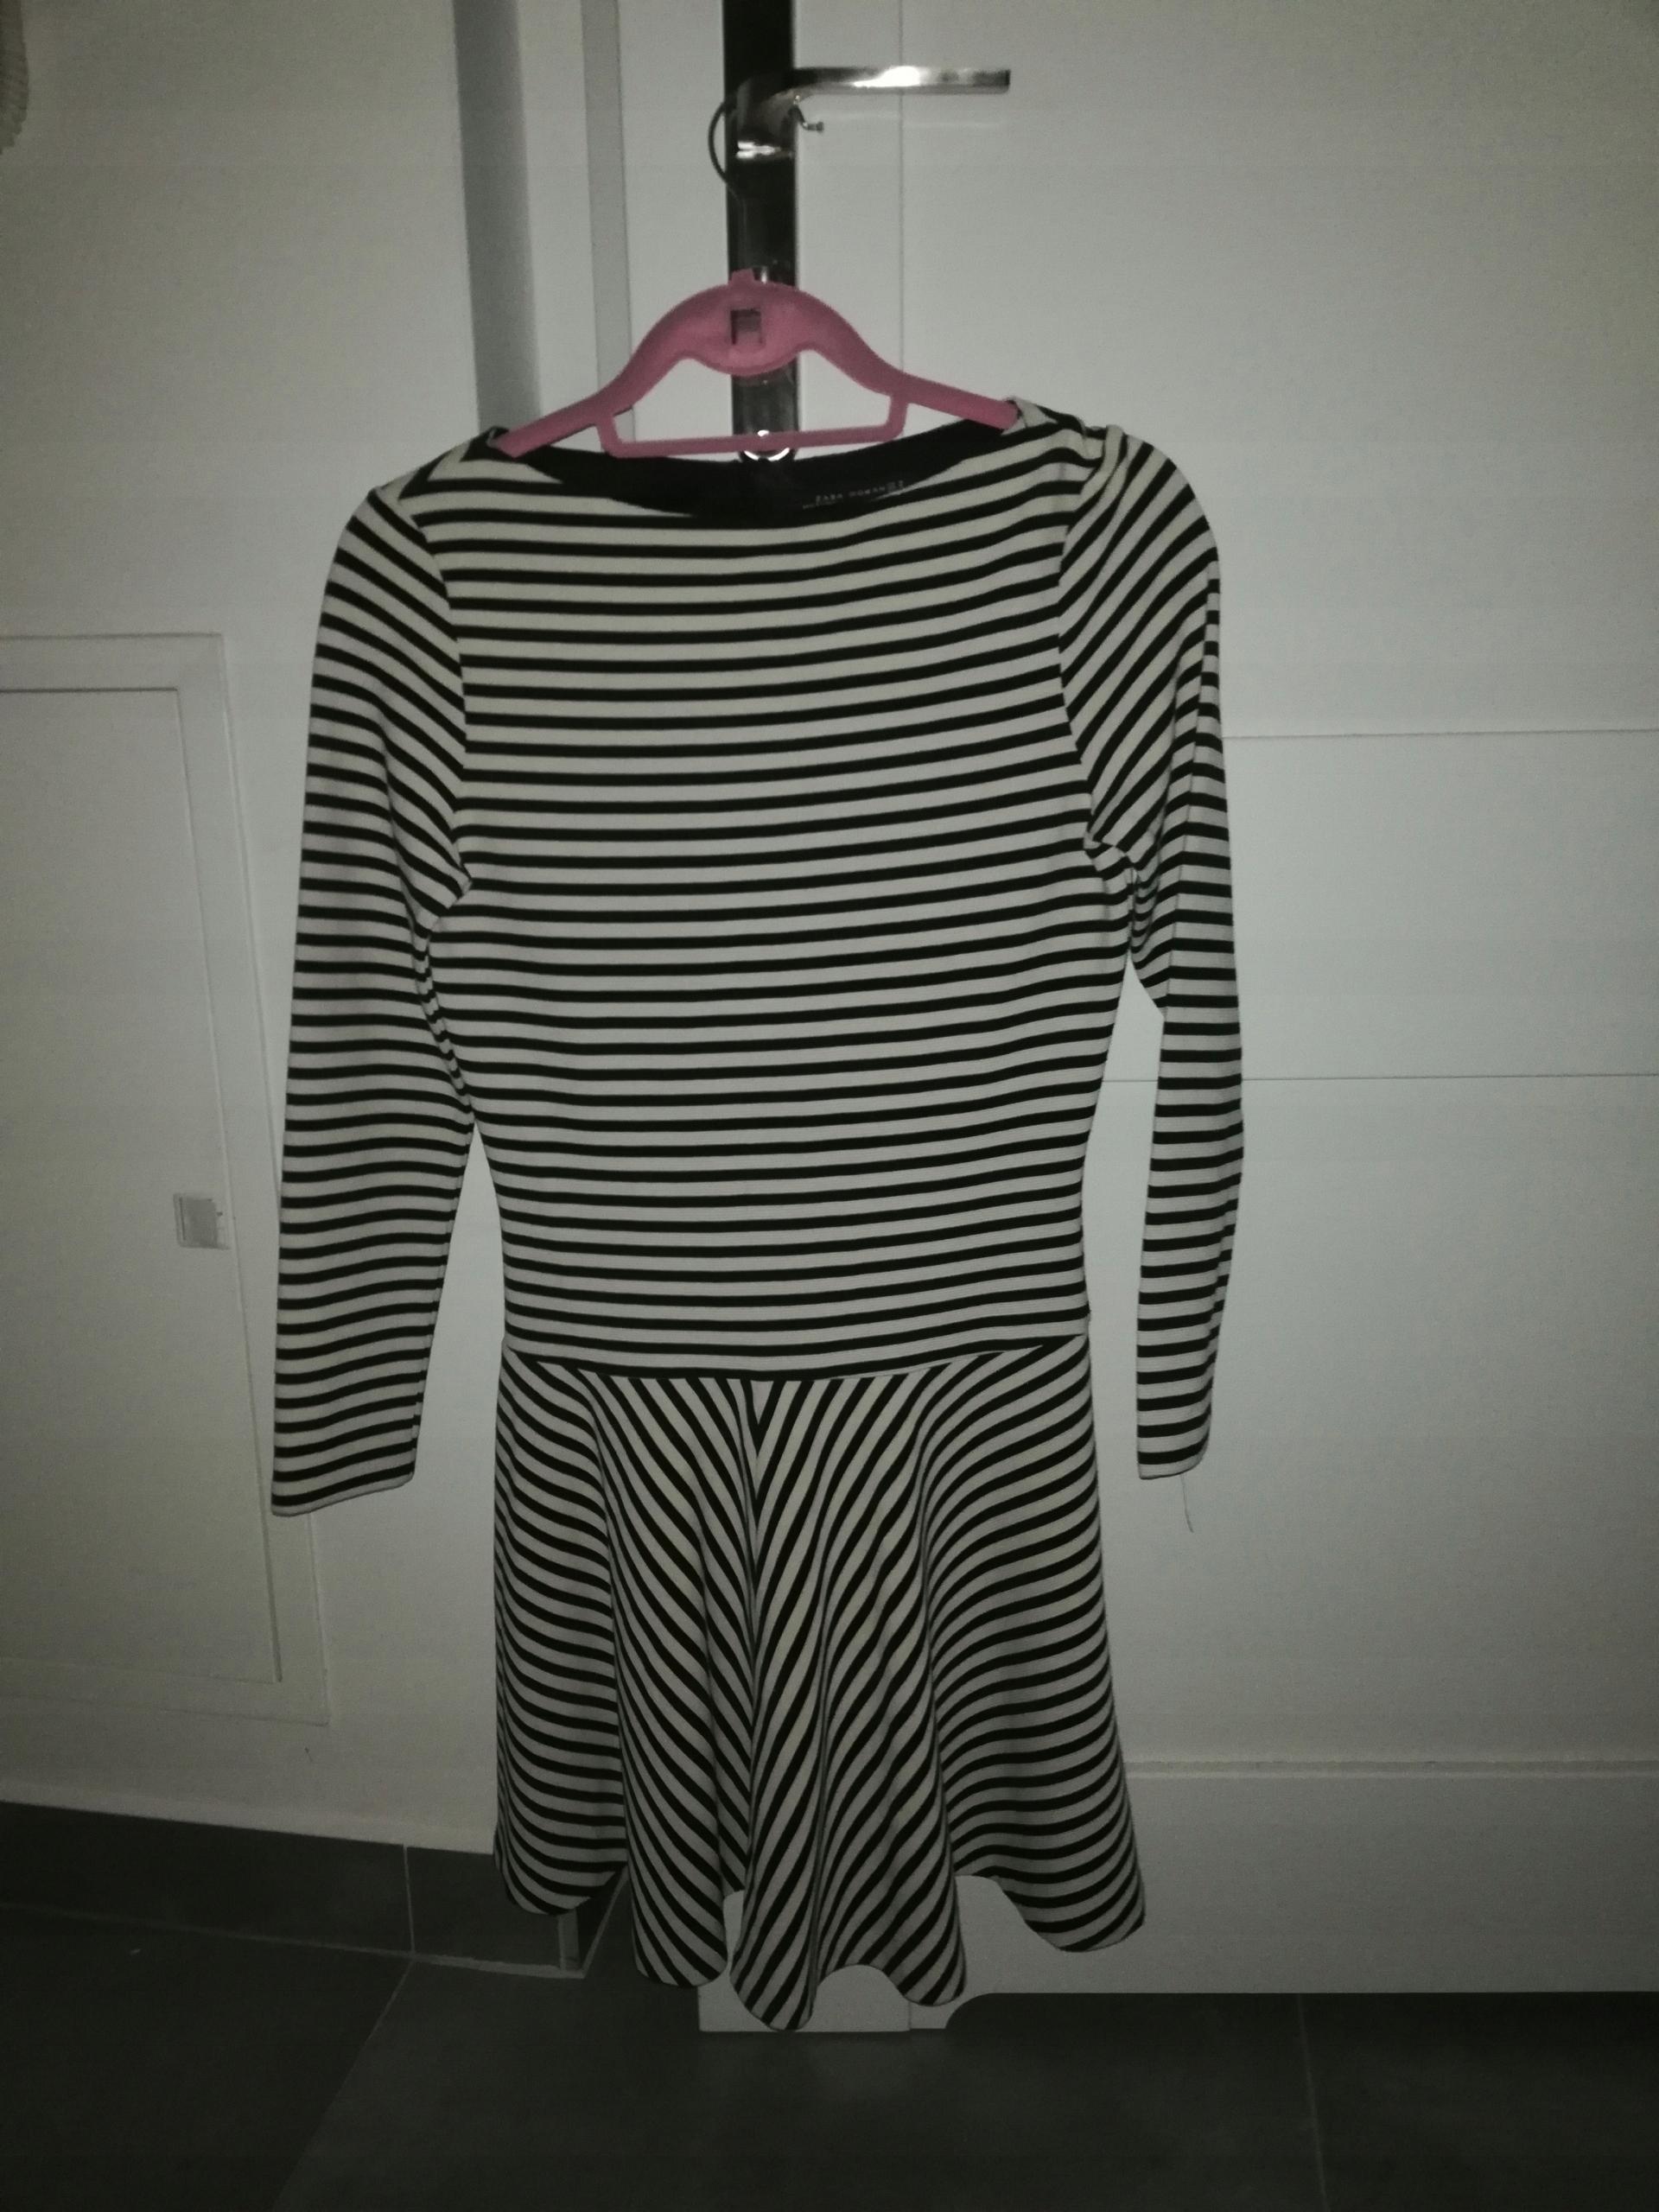 7af31d3b8f sukienka ZARA marine 38   M - 7515443952 - oficjalne archiwum allegro